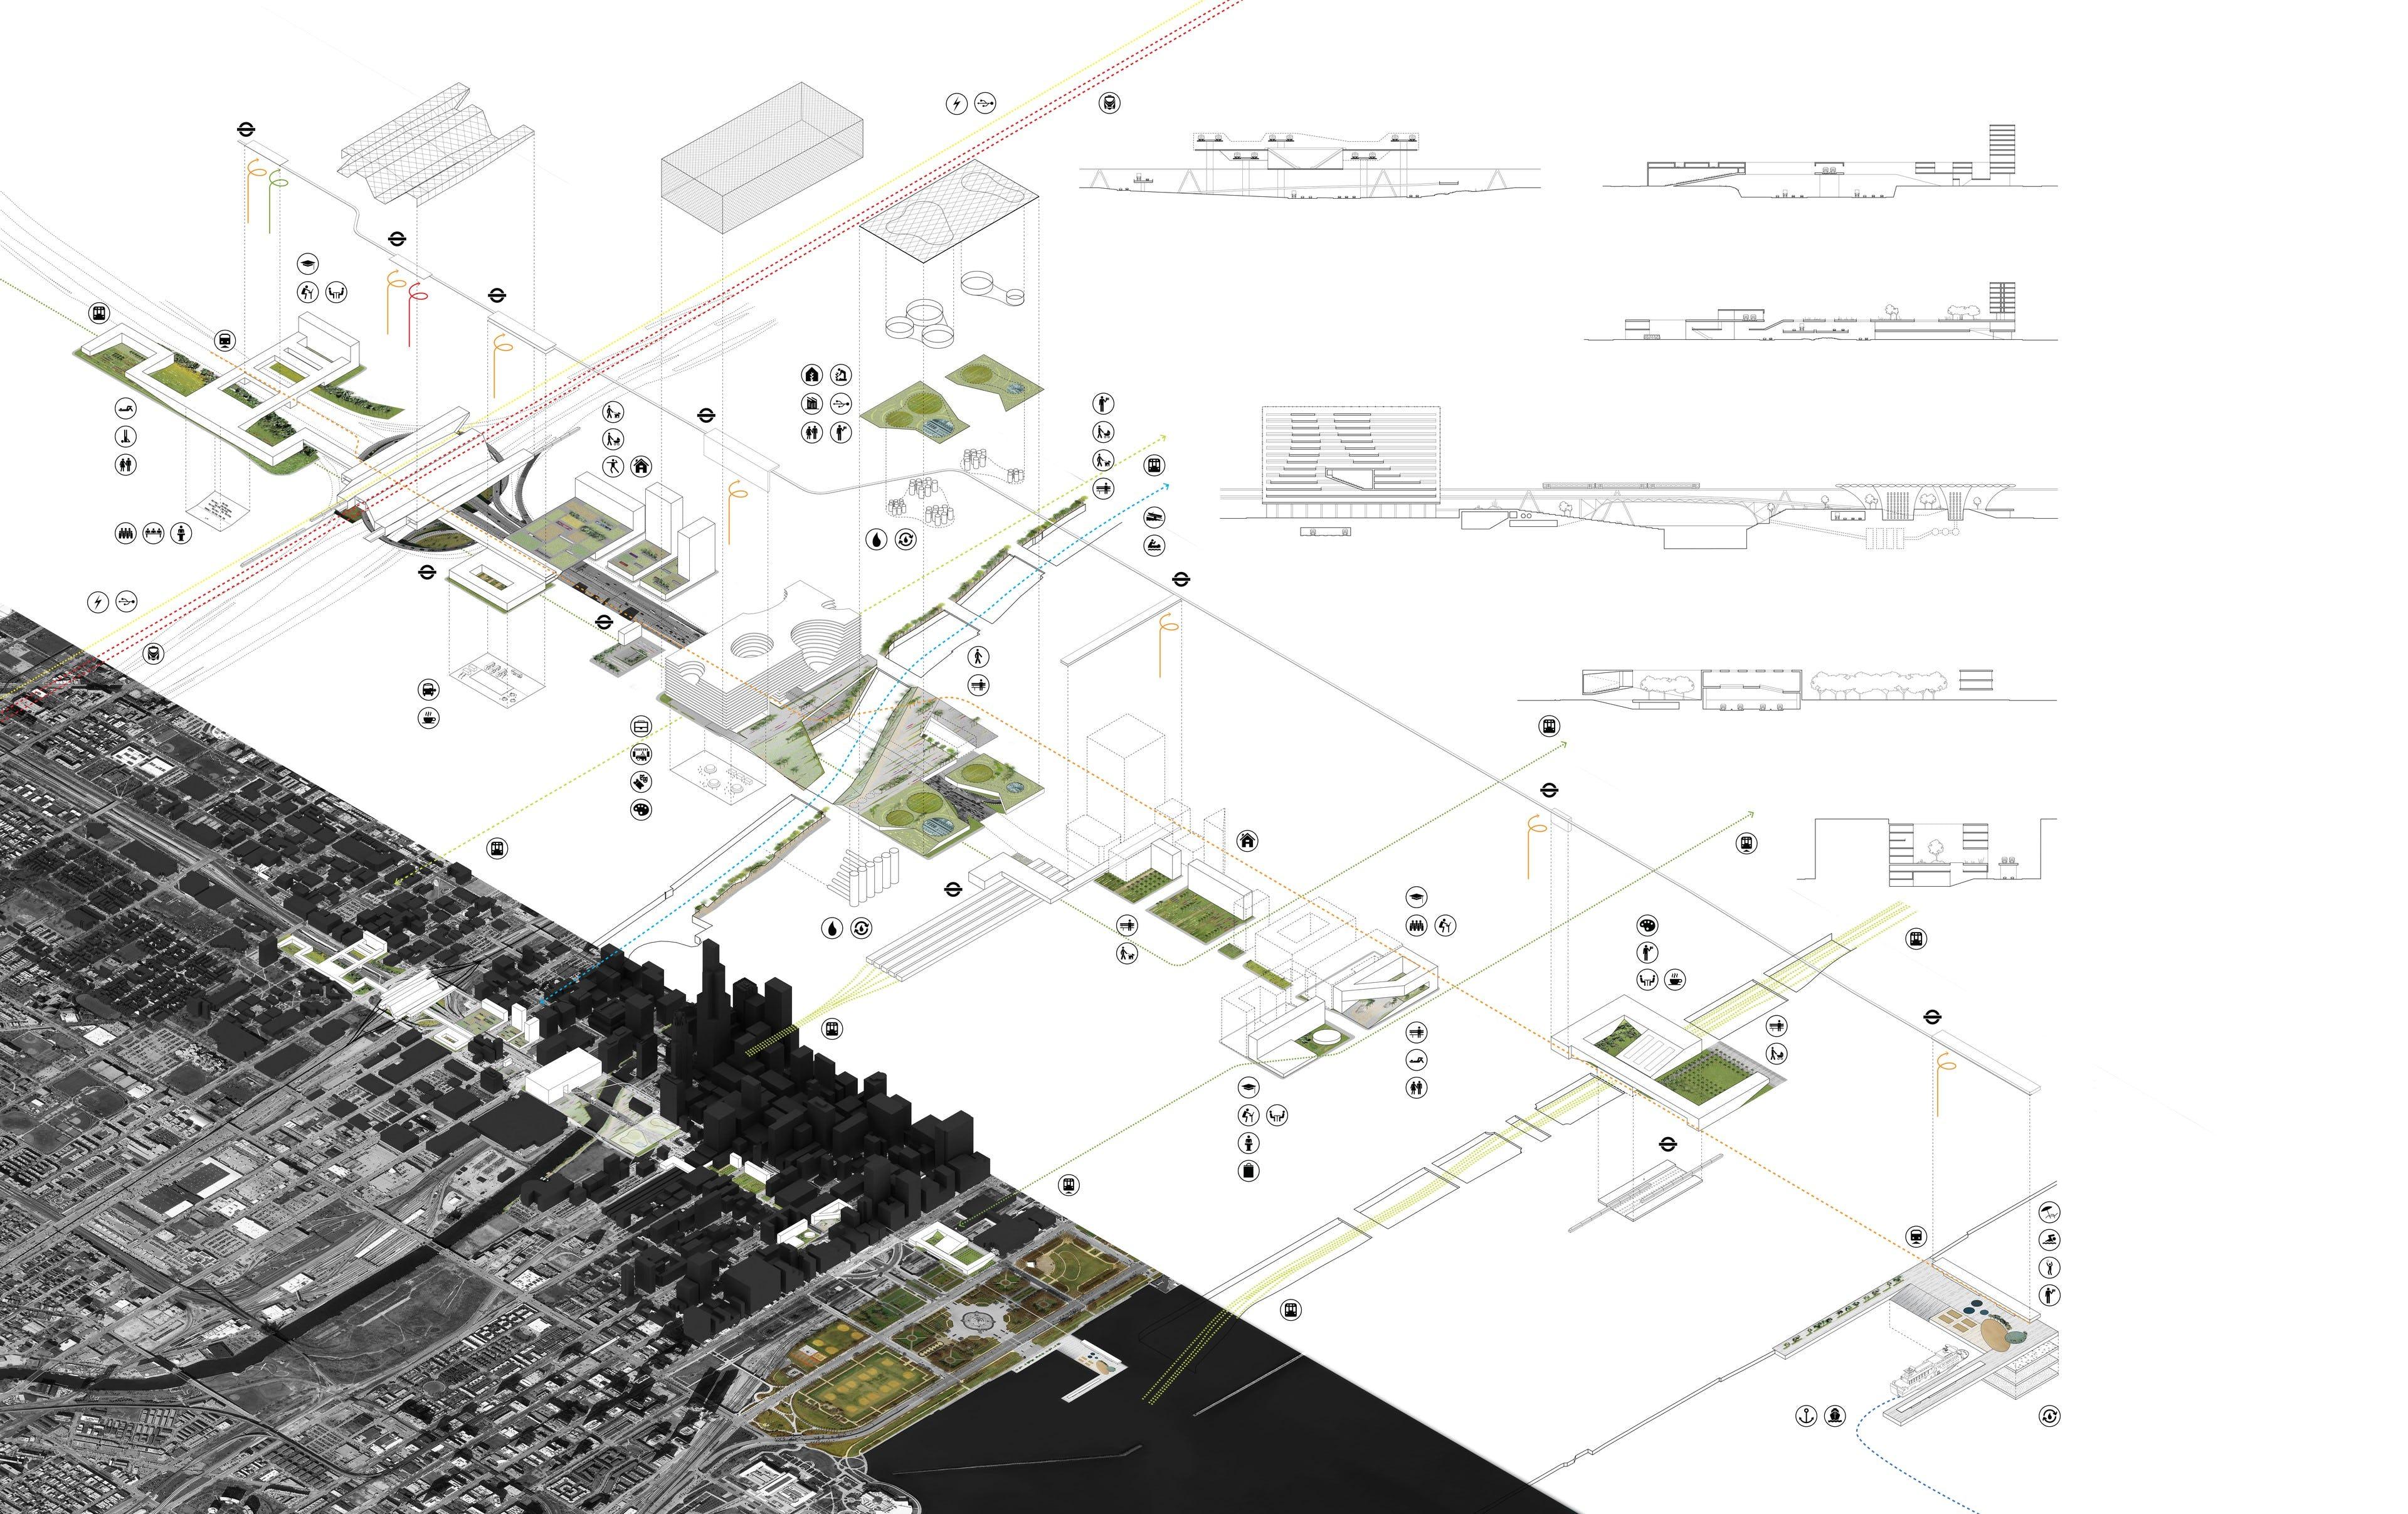 Rvtr conduit urbanism 23